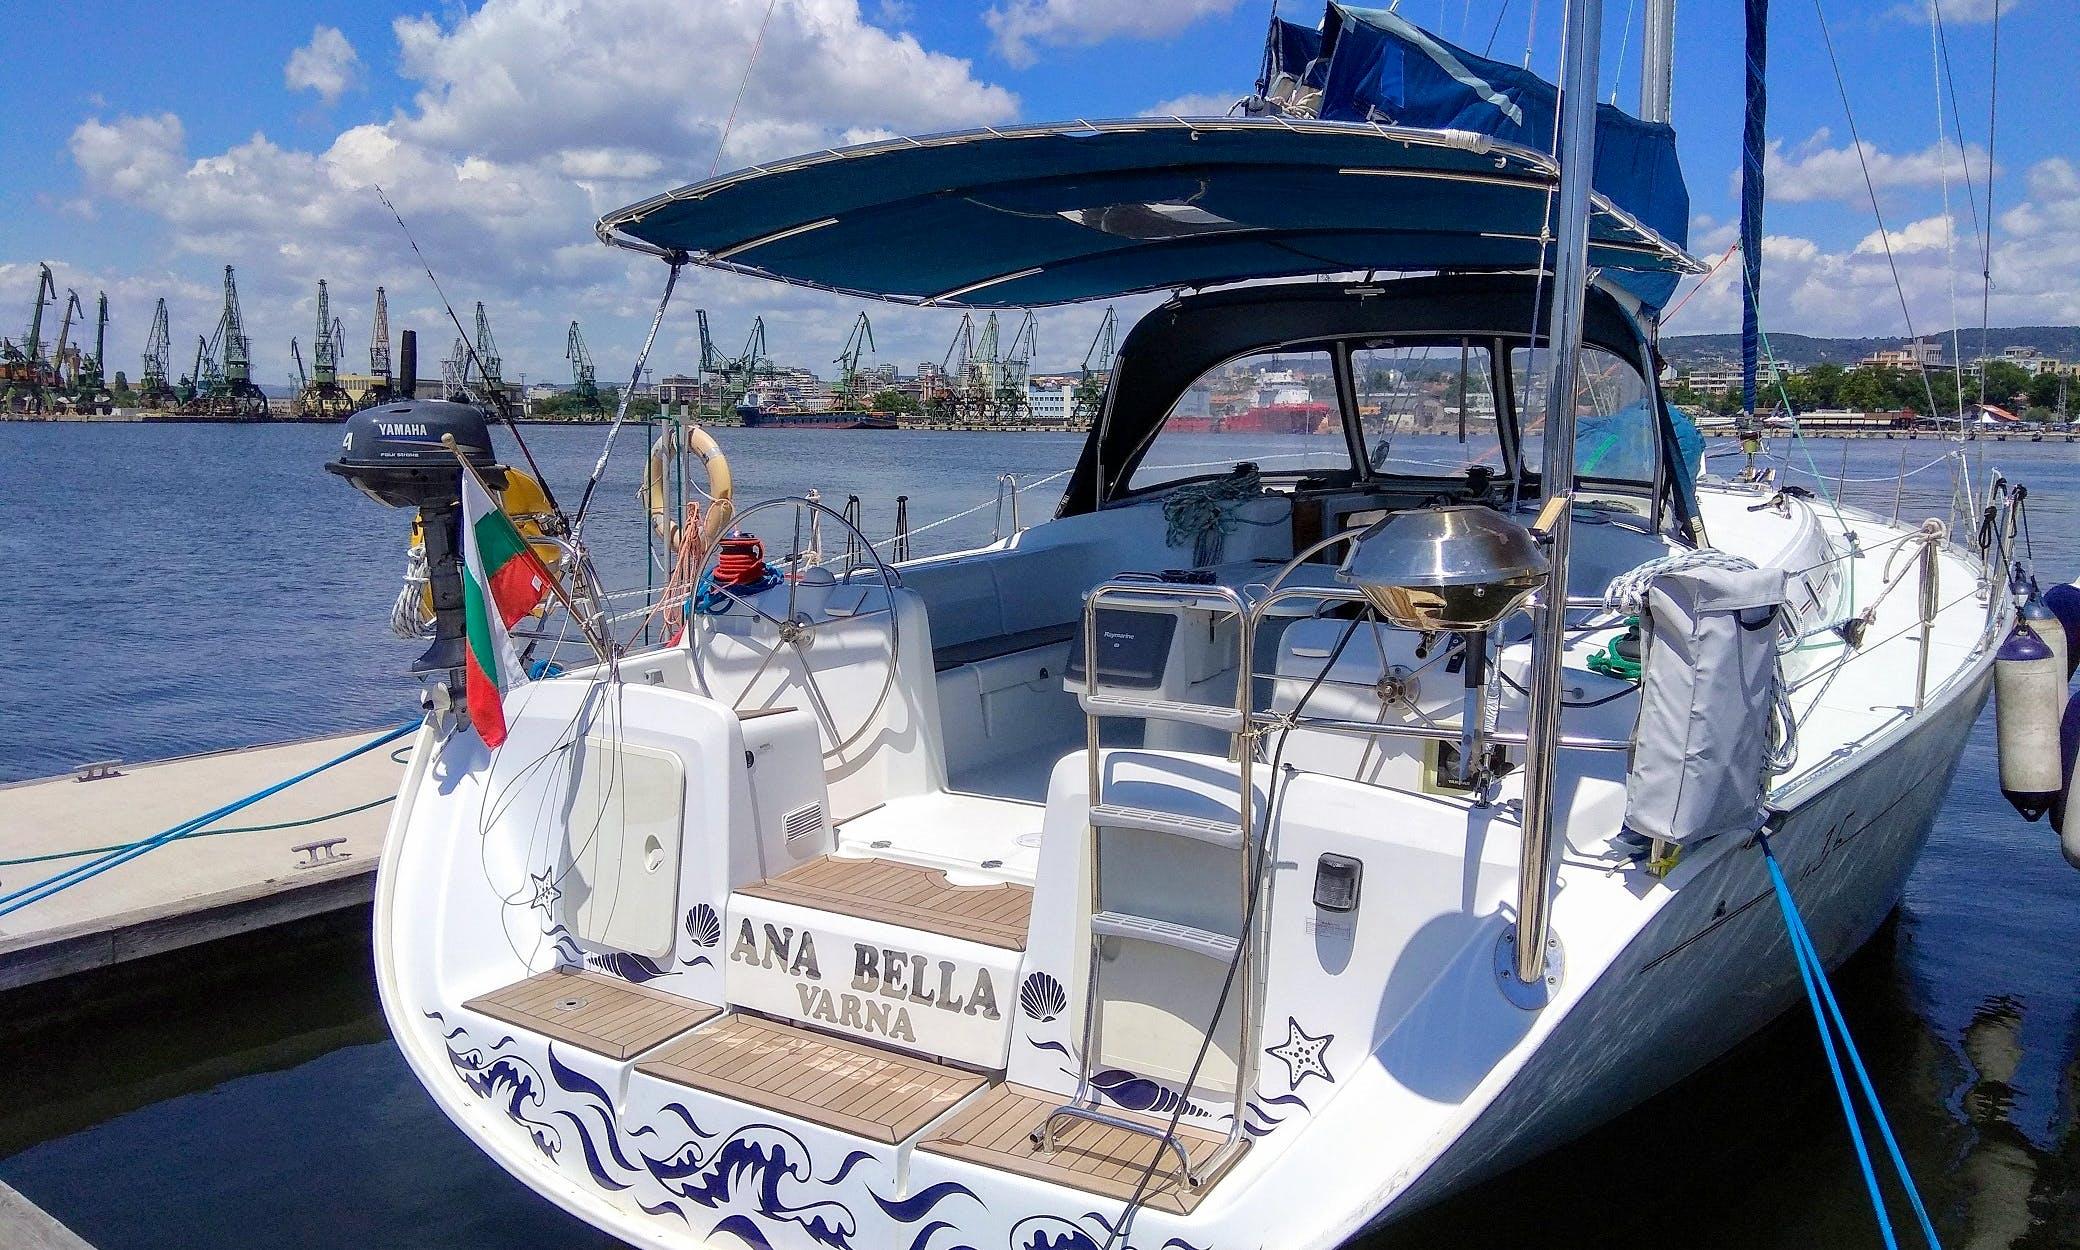 Sail on this Cruising Monohull rental in Varna, Bulgaria